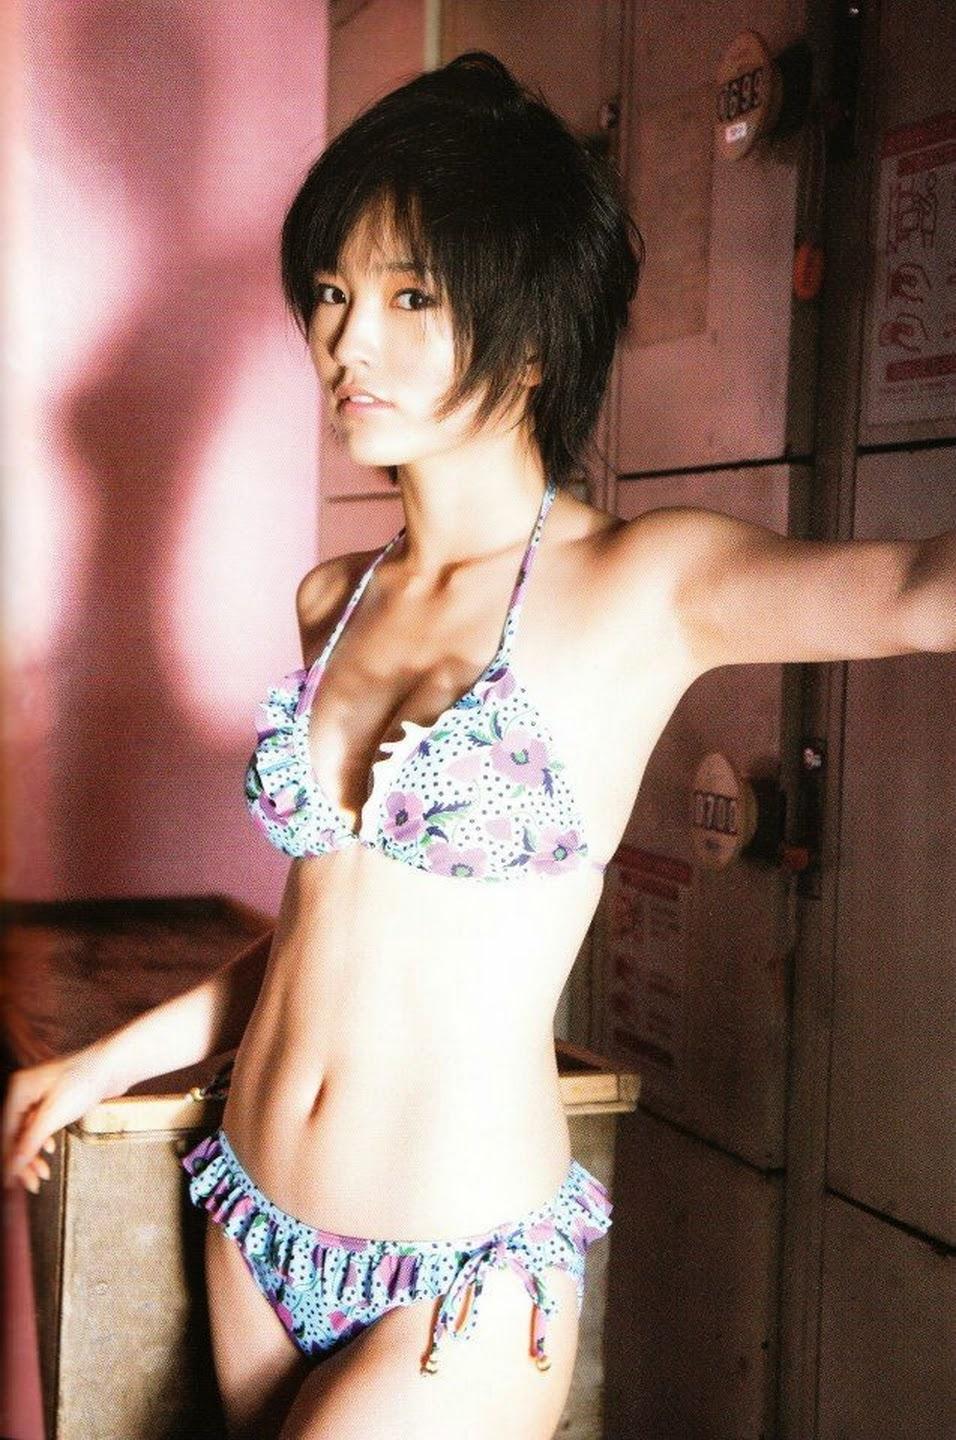 ls- nude imagesize: 956x1440 101 Nao Kanzaki and a few friends: Sayaka Yamamoto: Sayagami photobook scans #2